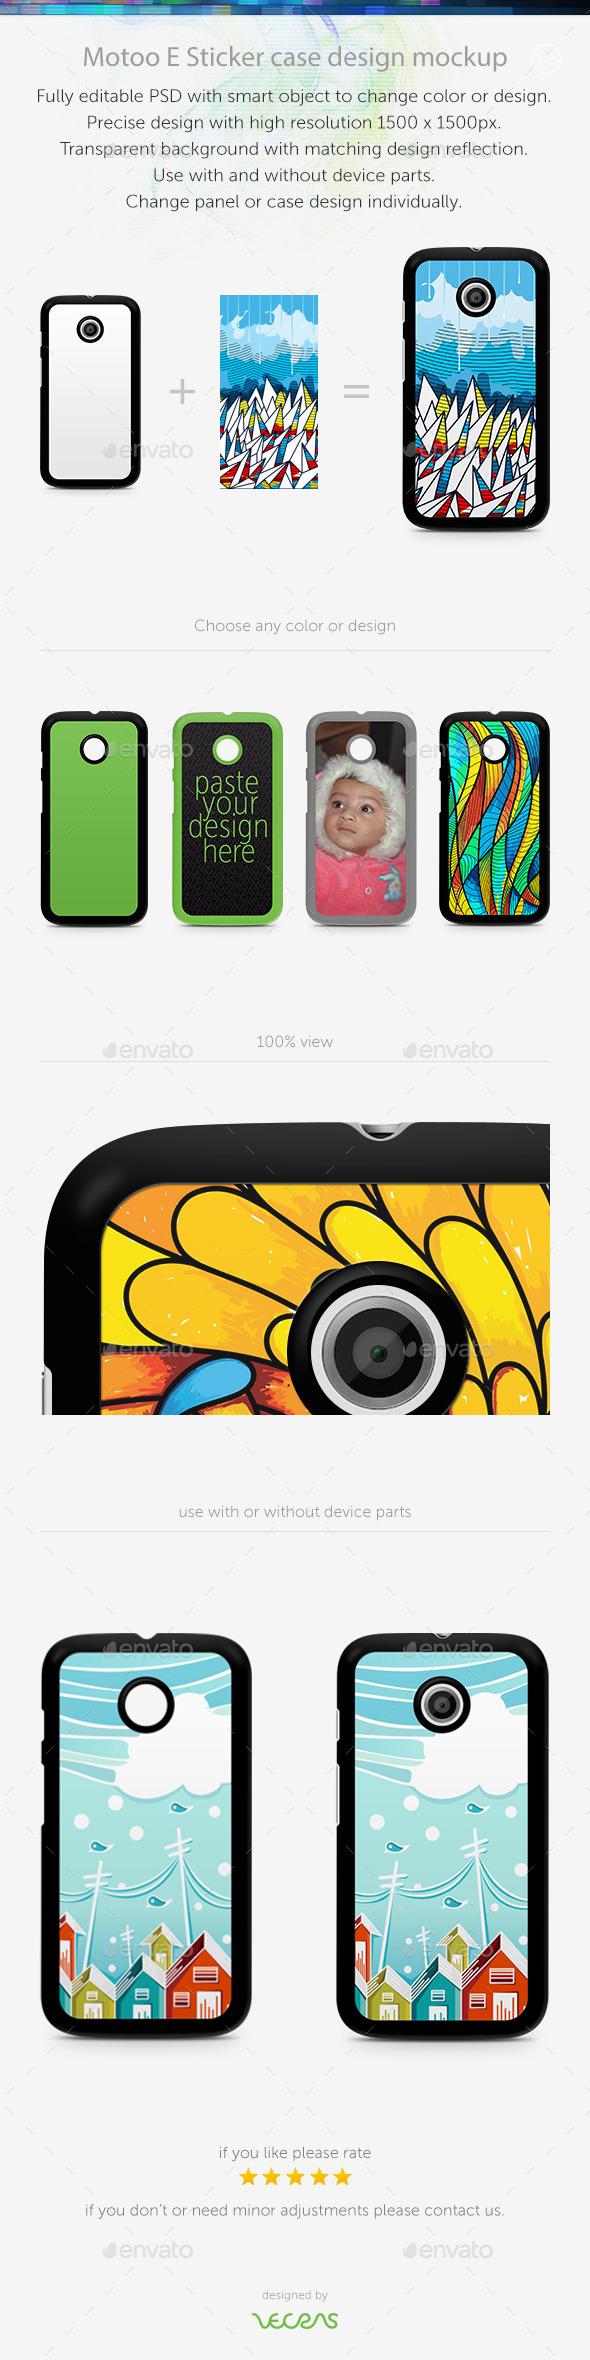 Motoo E Sticker Case Design Mockup - Mobile Displays